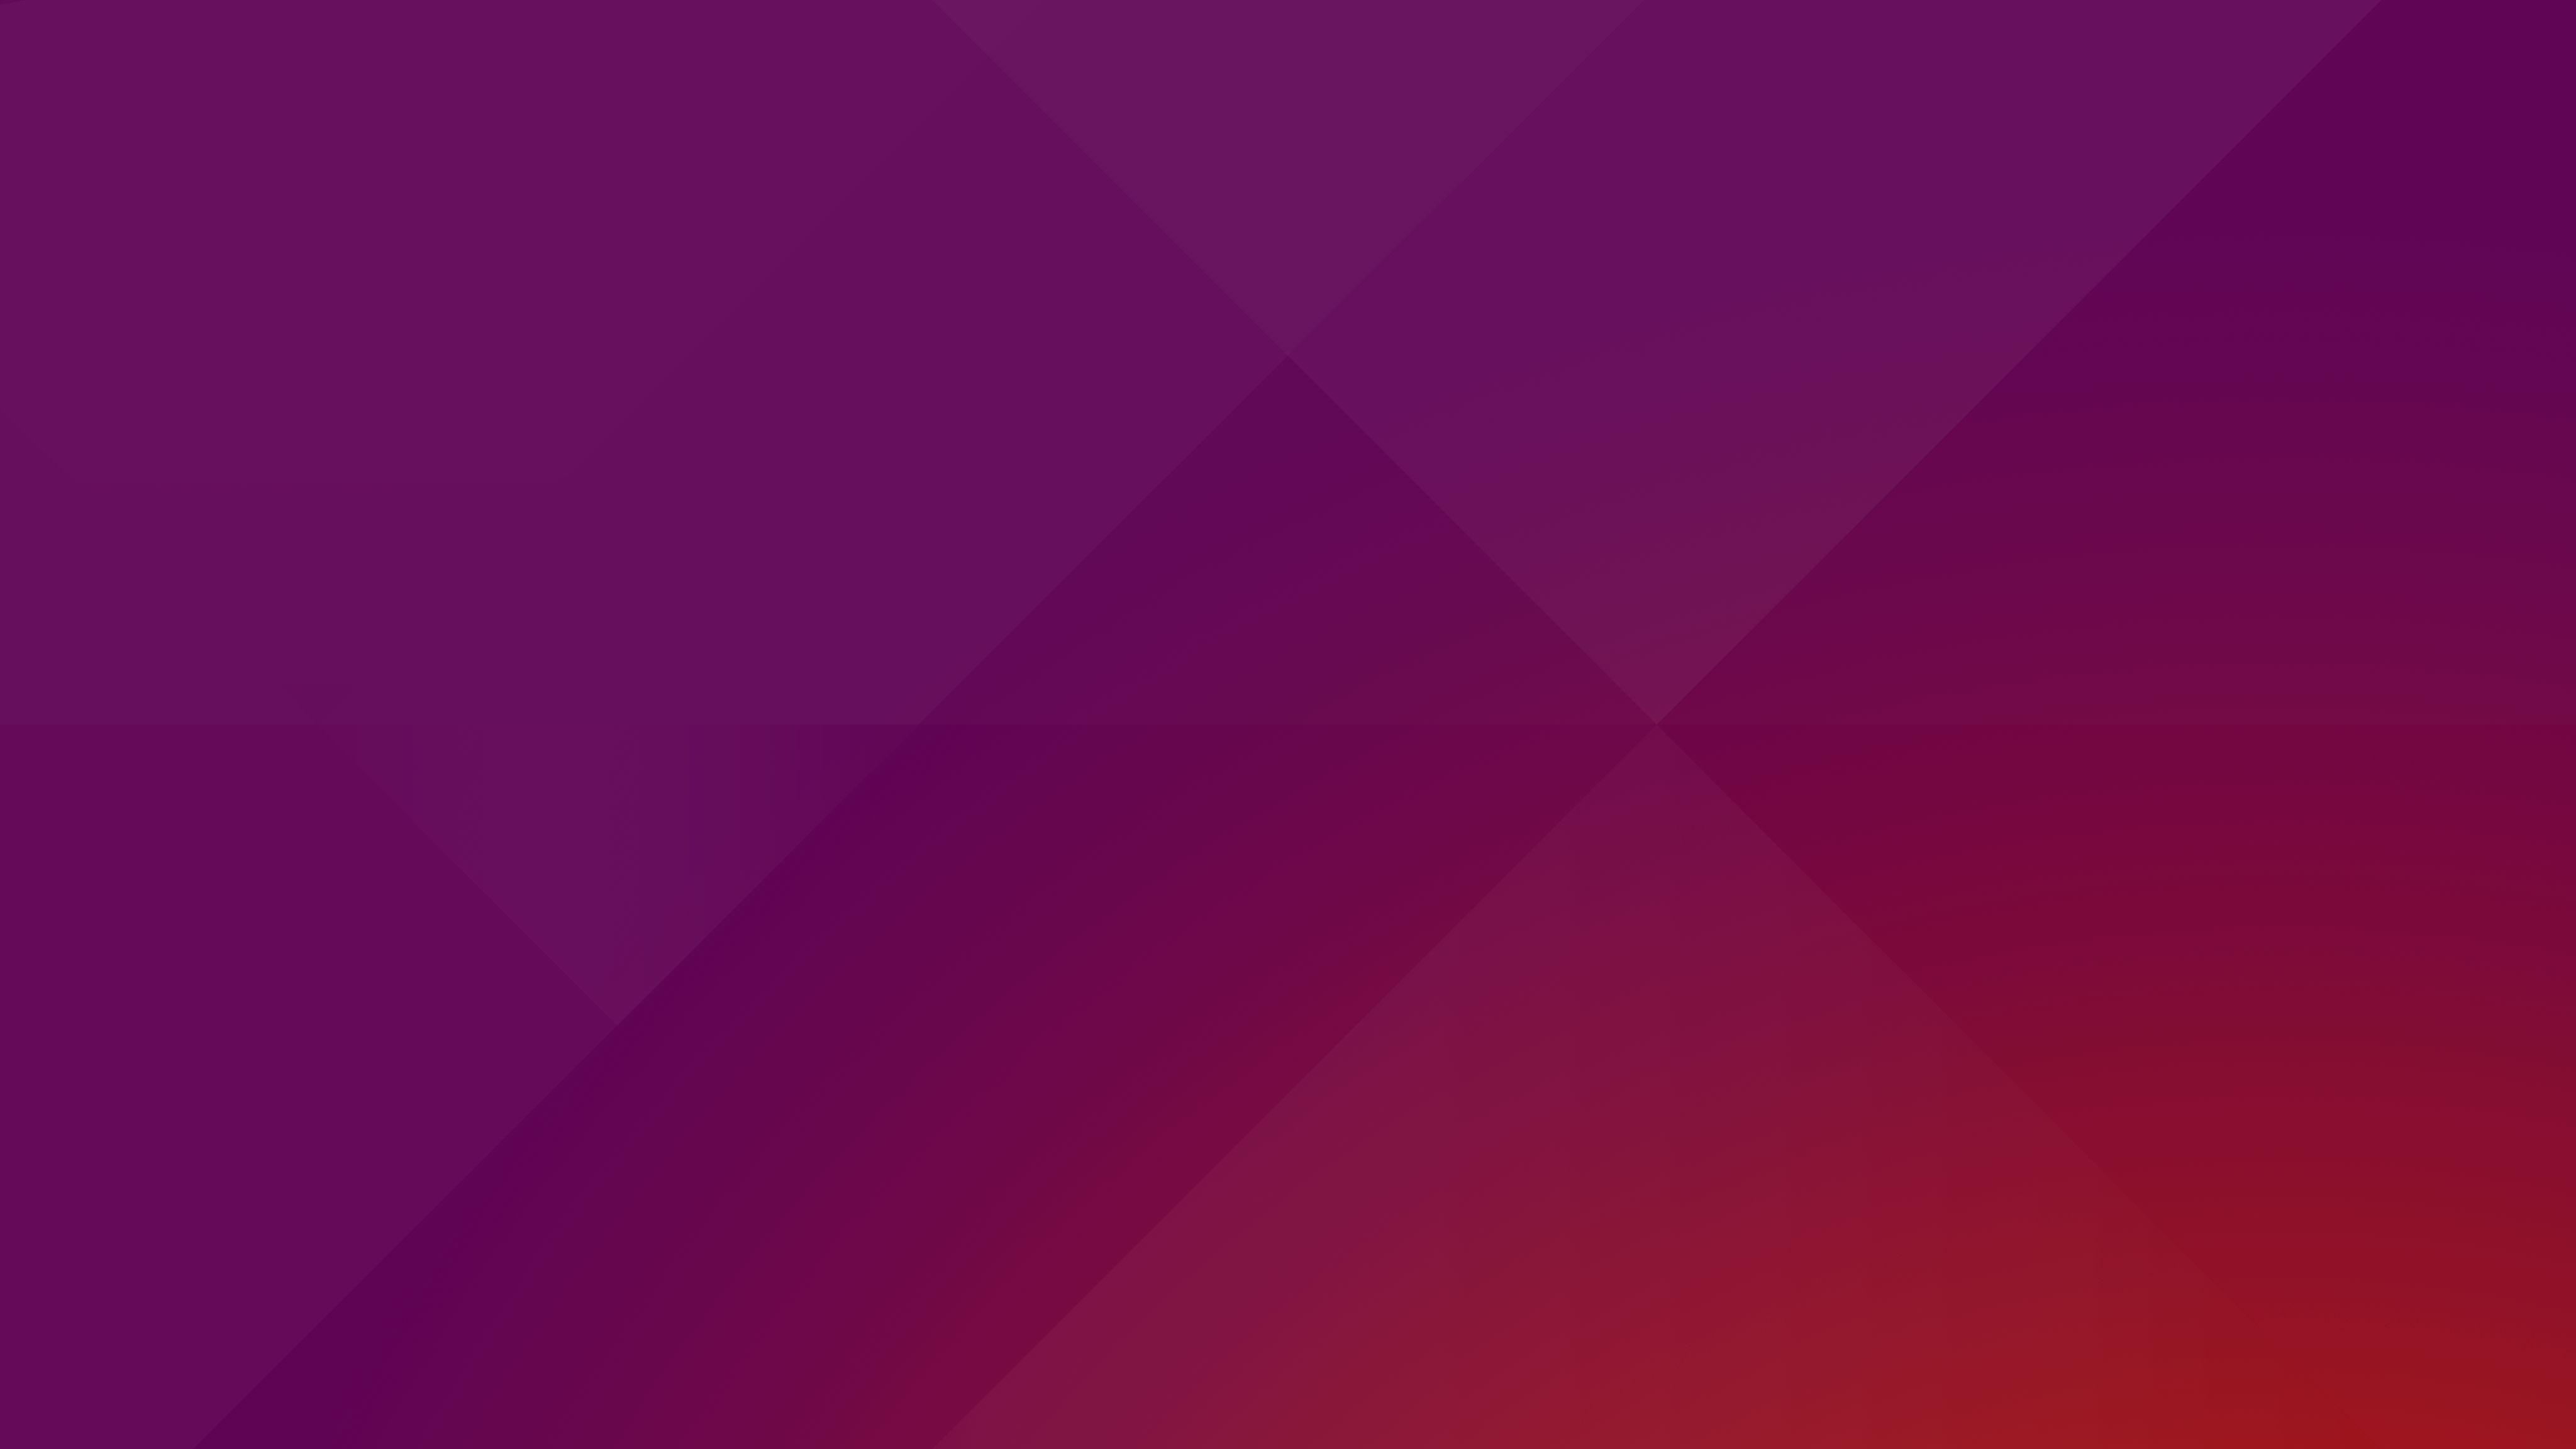 Ubuntu 4k - Ubuntu 15.04 , HD Wallpaper & Backgrounds